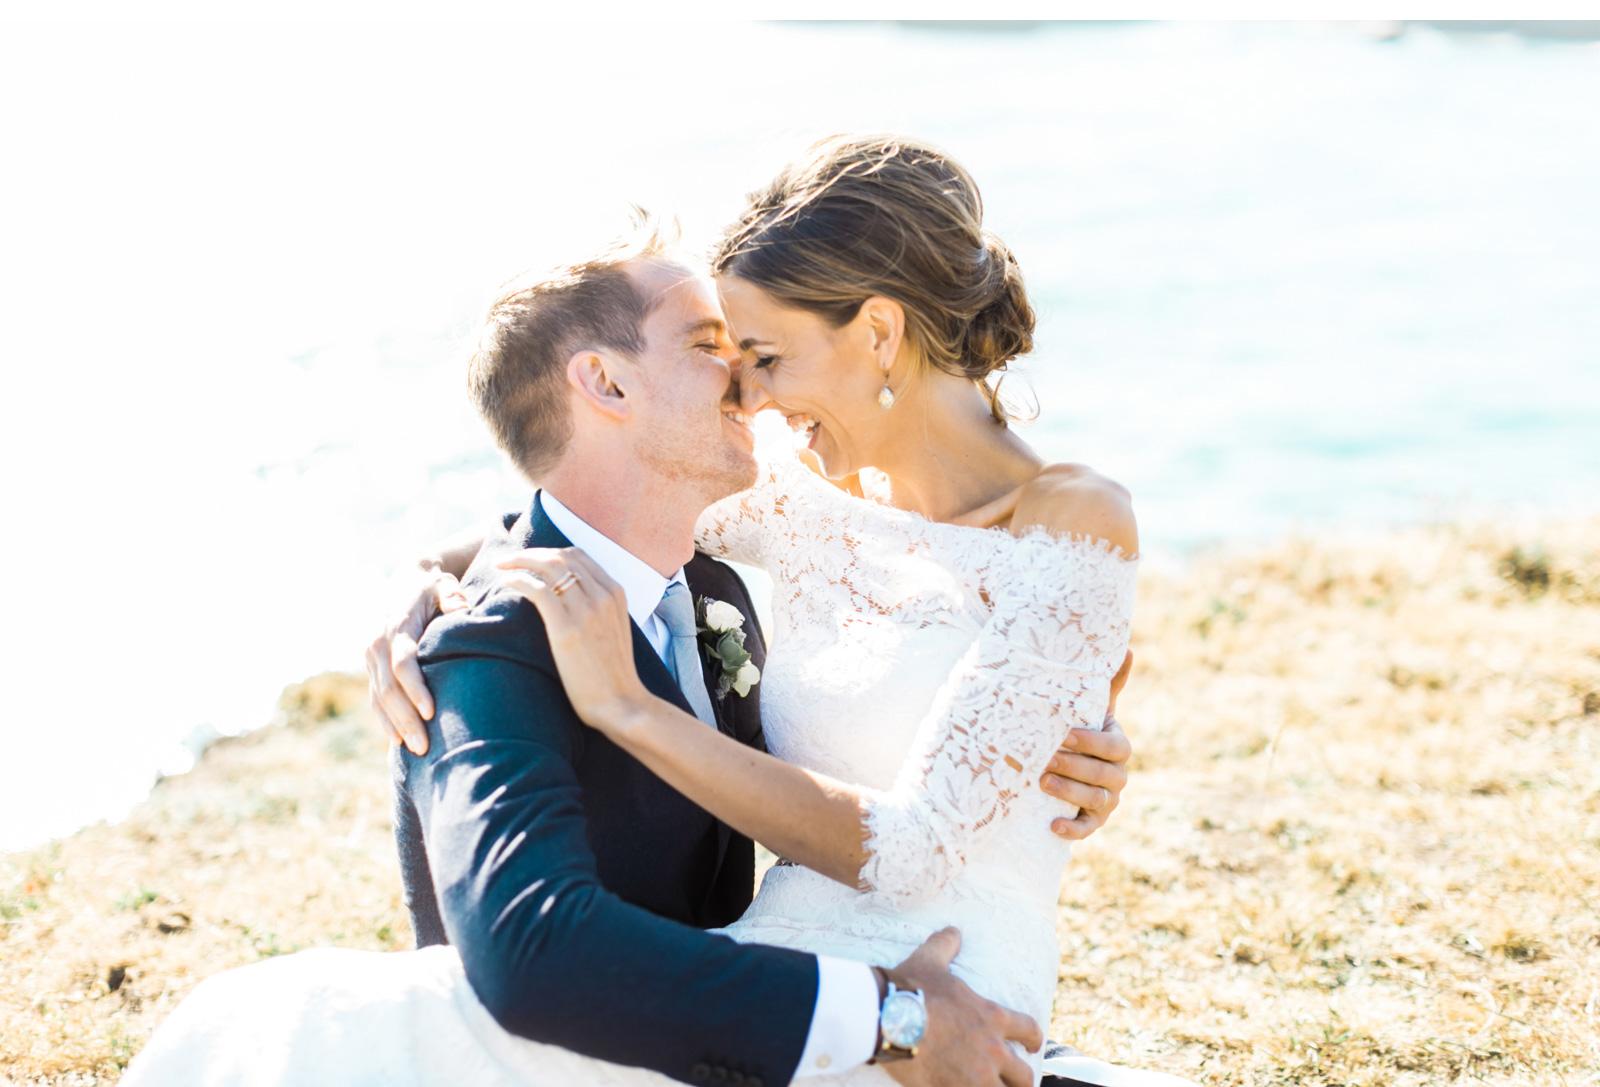 Style-Me-Pretty-Mendocino-Wedding-Natalie-Schutt-Photography_10.jpg